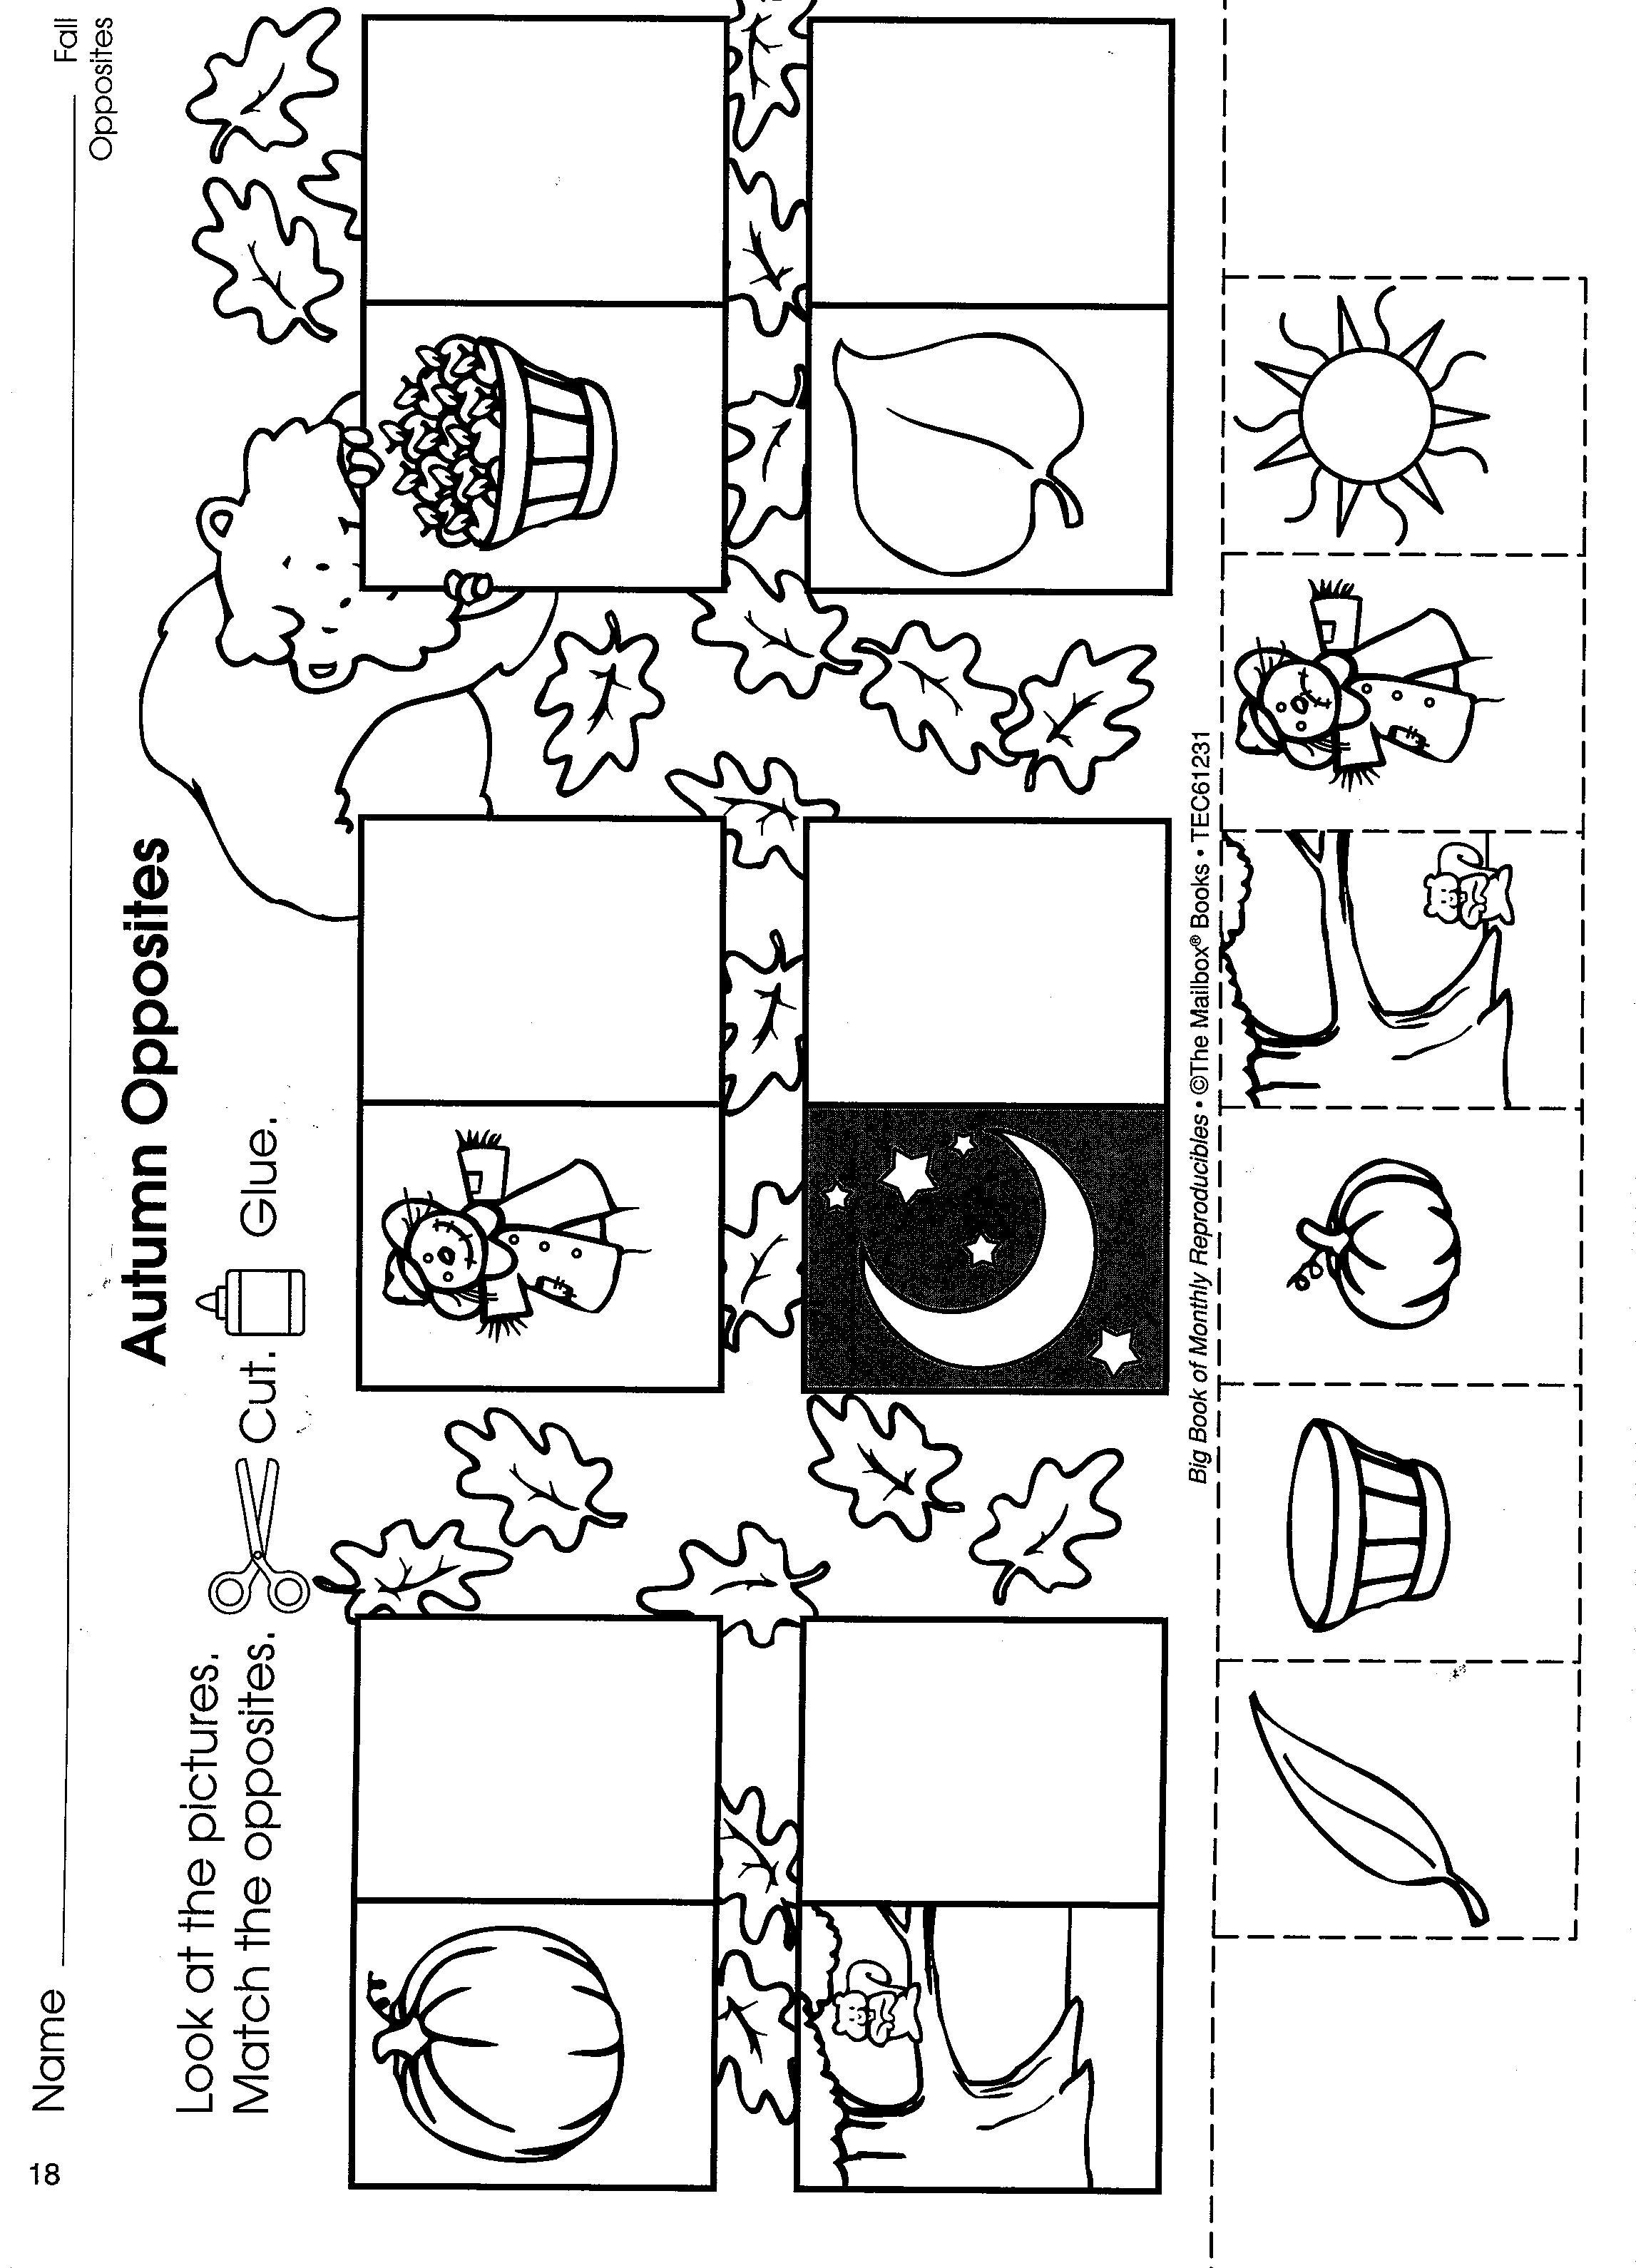 Worksheets The Mailbox Worksheets pin by natalie edgar on opposites theme pinterest preschool fall worksheet math ideas preschool